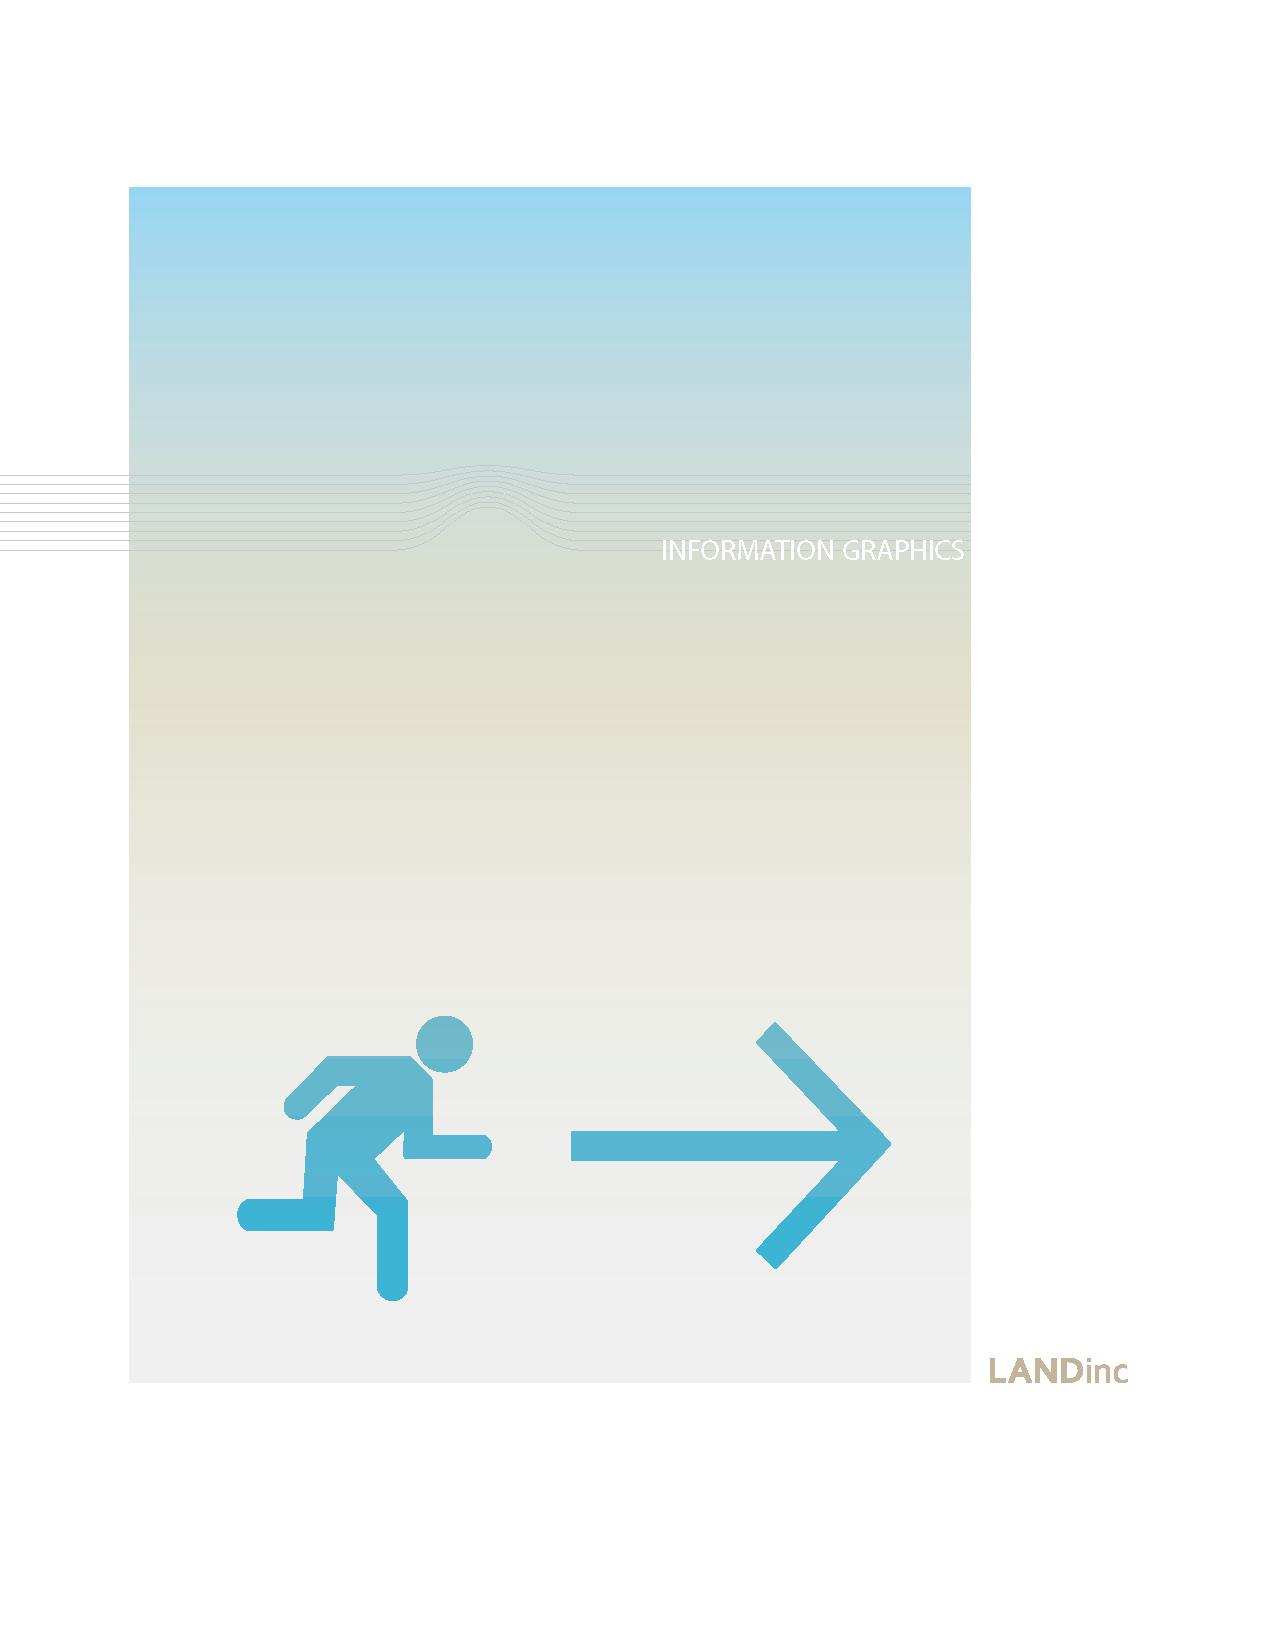 LANDinc_All_Page_192.jpg